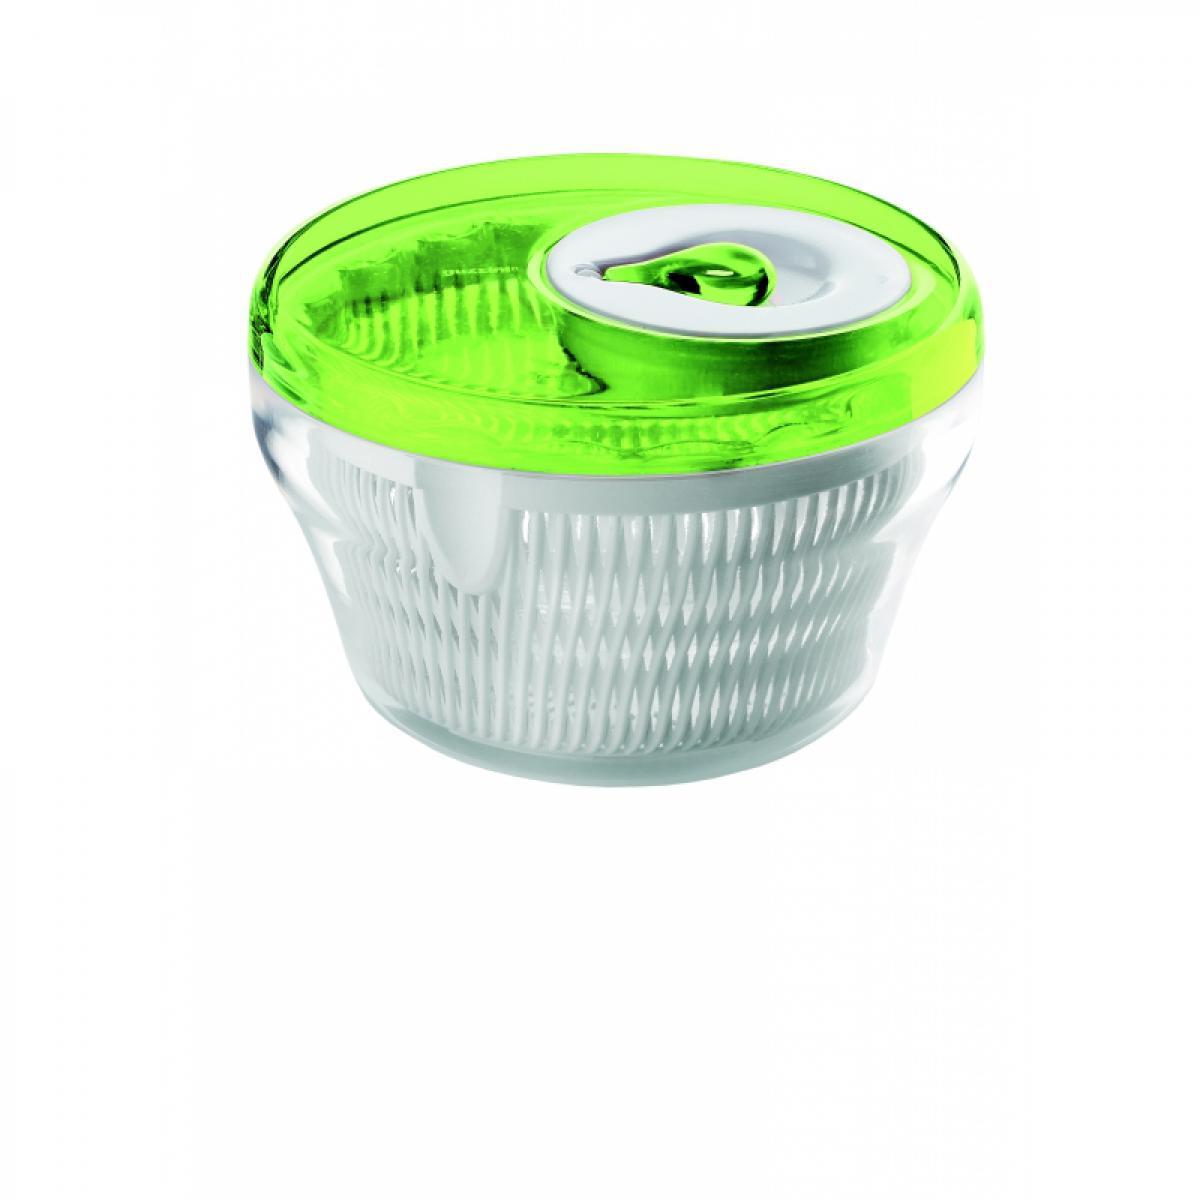 Guzzini Essoreuse à salade - D 22 cm - Vert